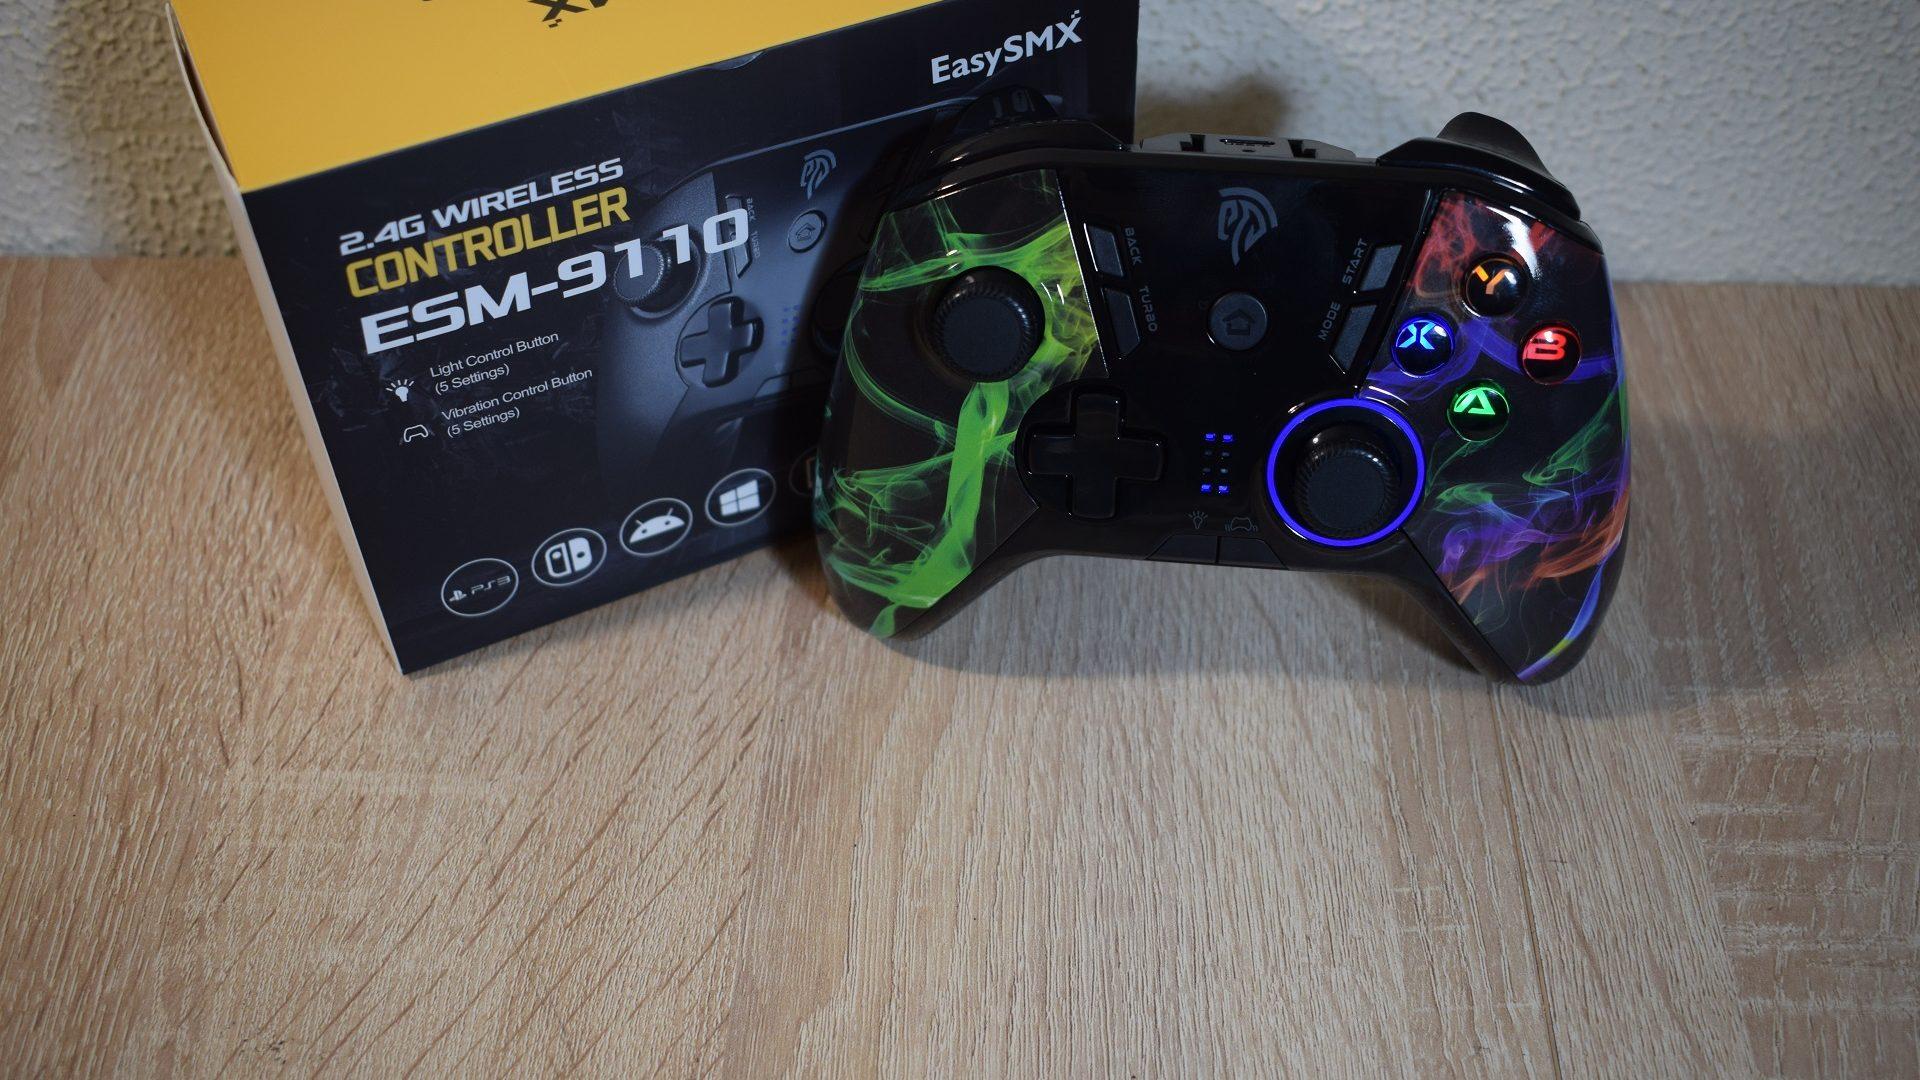 easysmx esm-91 10 game it